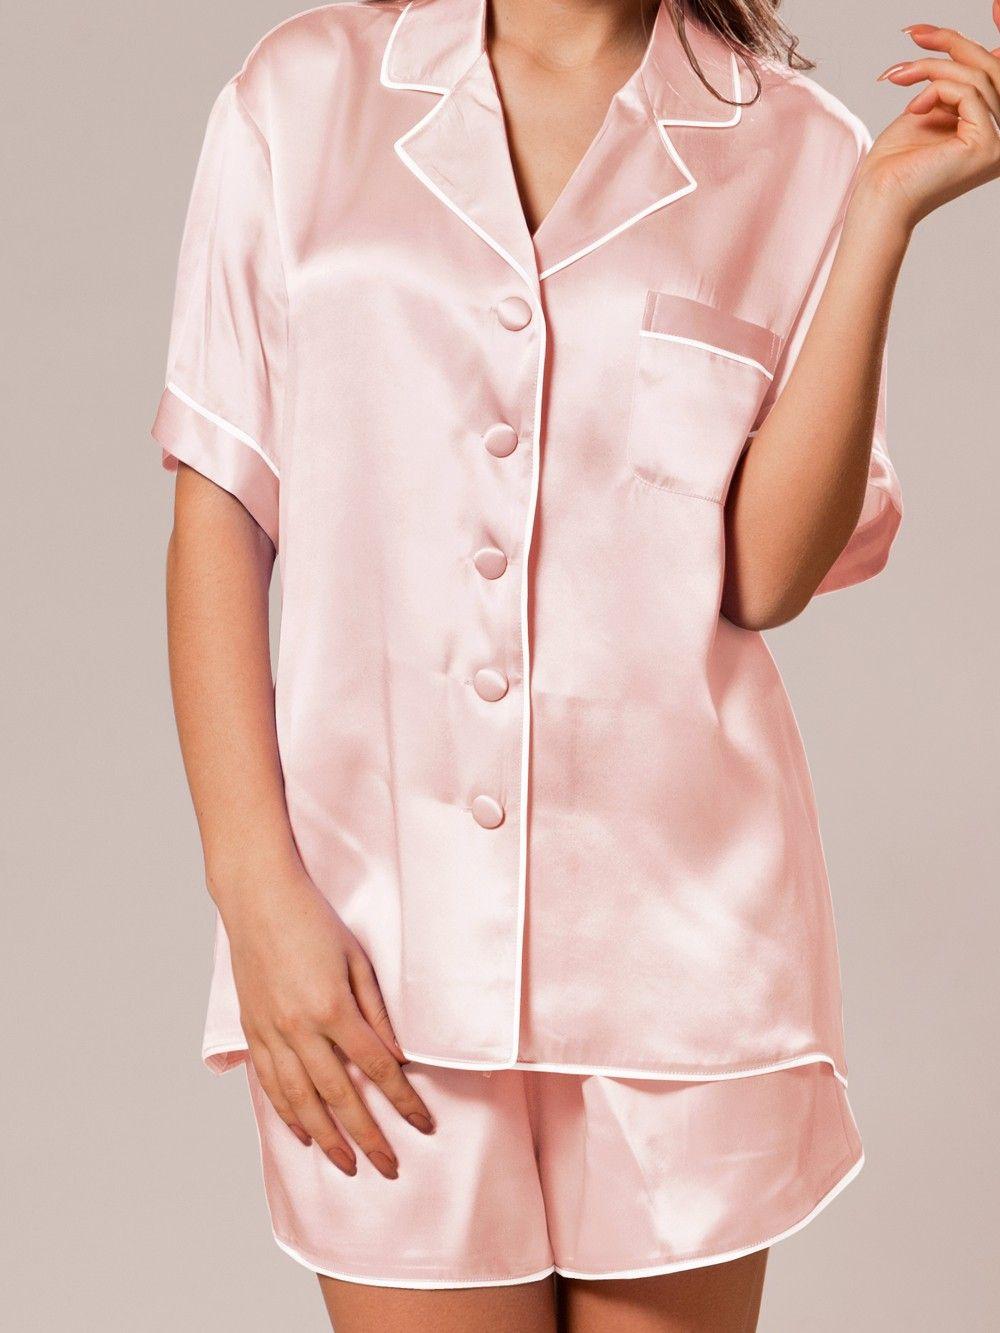 88edd133f8 silk pajama  silknightshirts. silk pajama  silknightshirts Silk Sleepwear